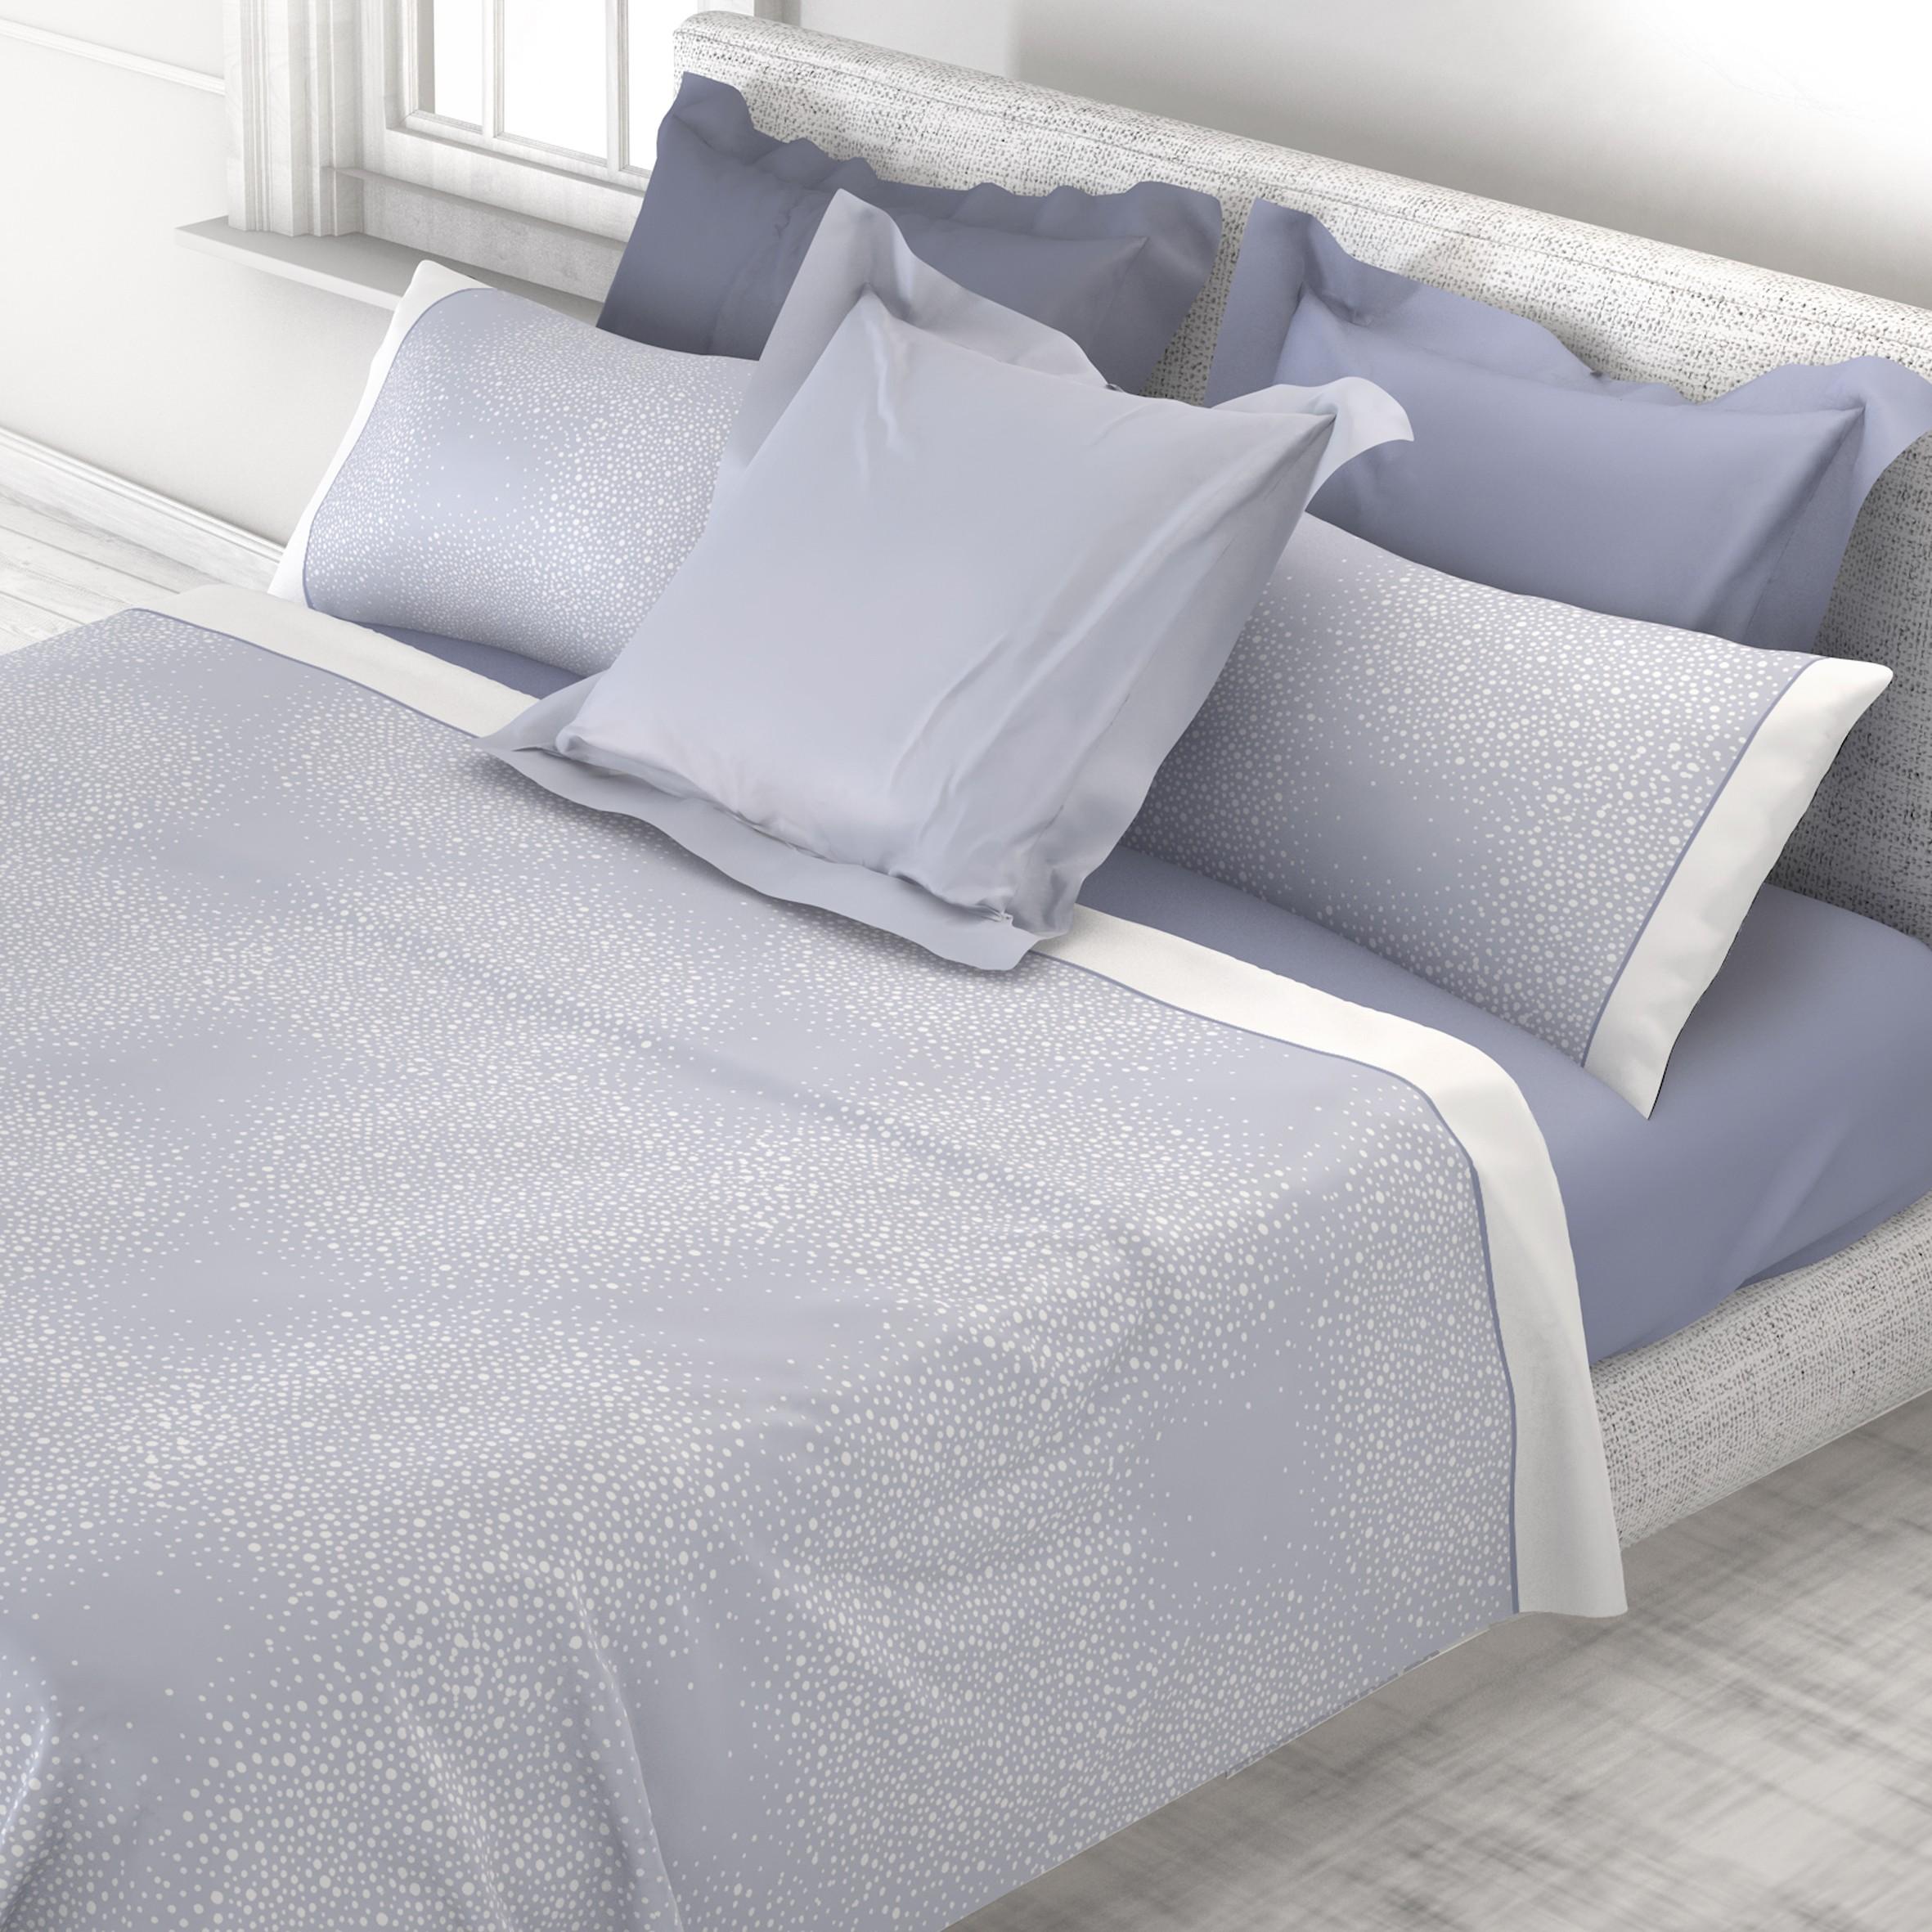 PV-20-201-1-501-irún-juego-sábanas-azul